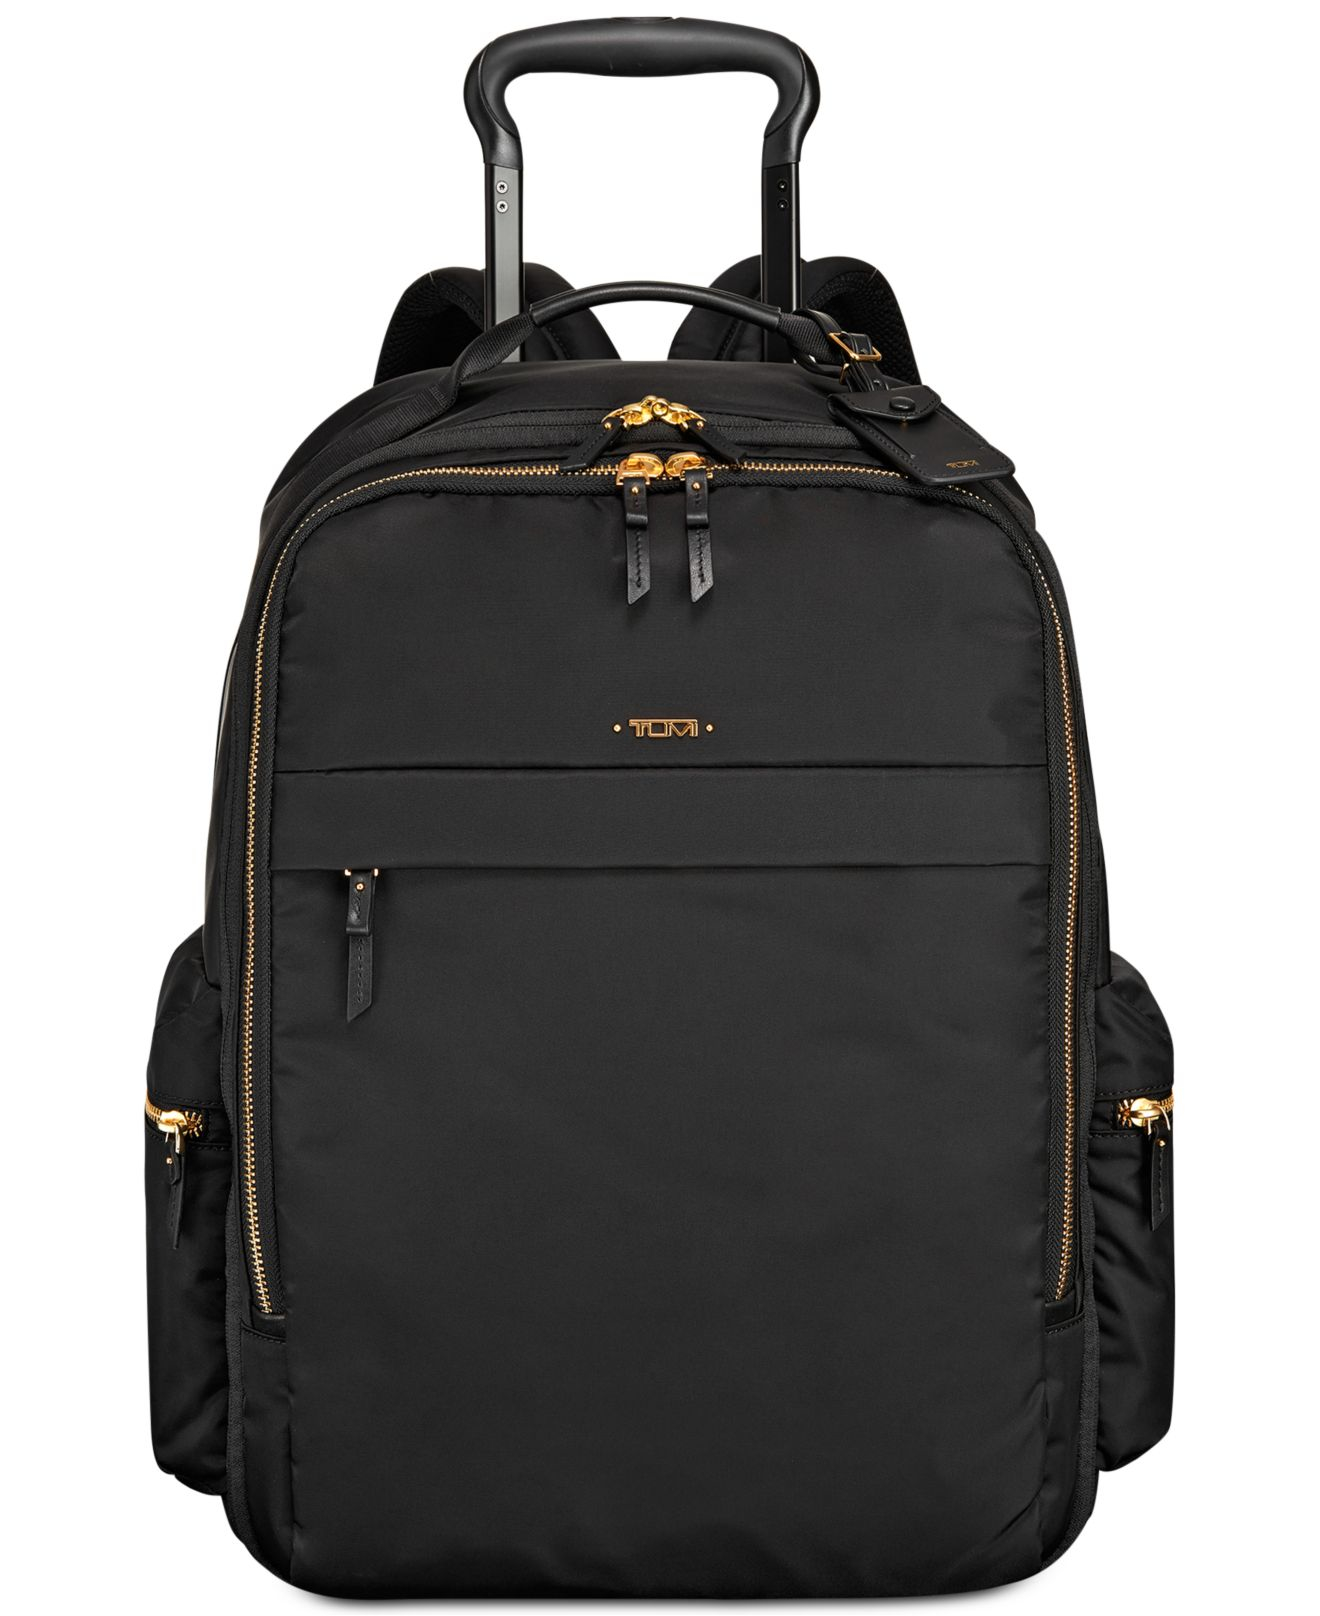 Lyst Tumi Voyageur Alta Rolling Backpack In Black For Men